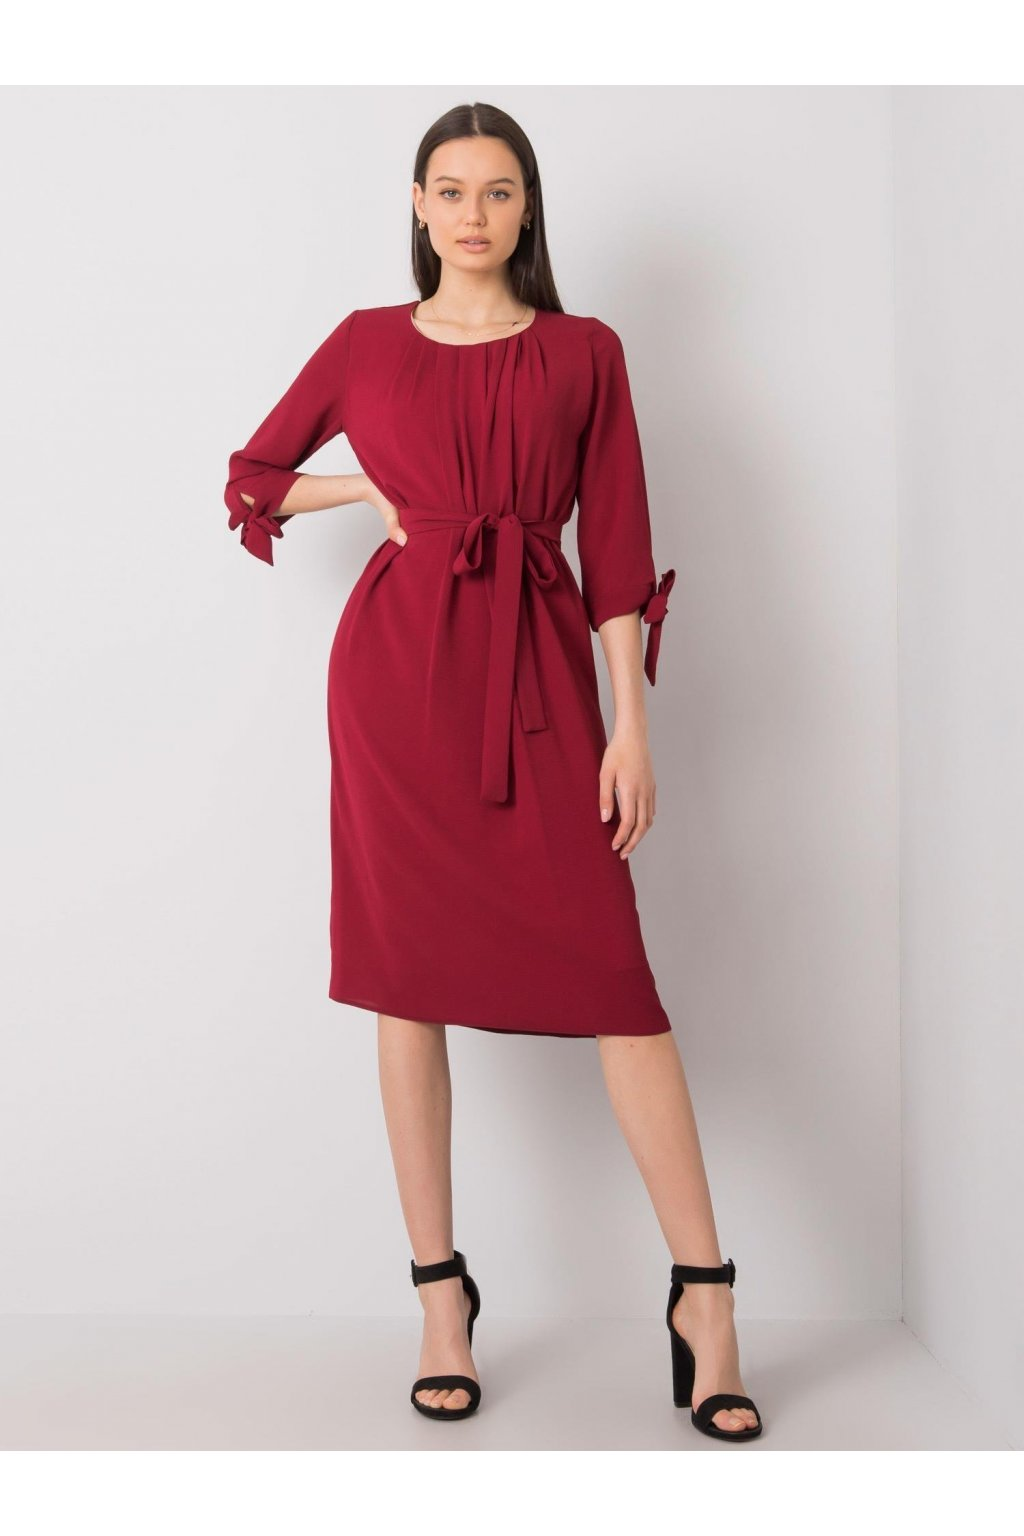 pol pl Bordowa sukienka koktajlowa Alethea 366807 2